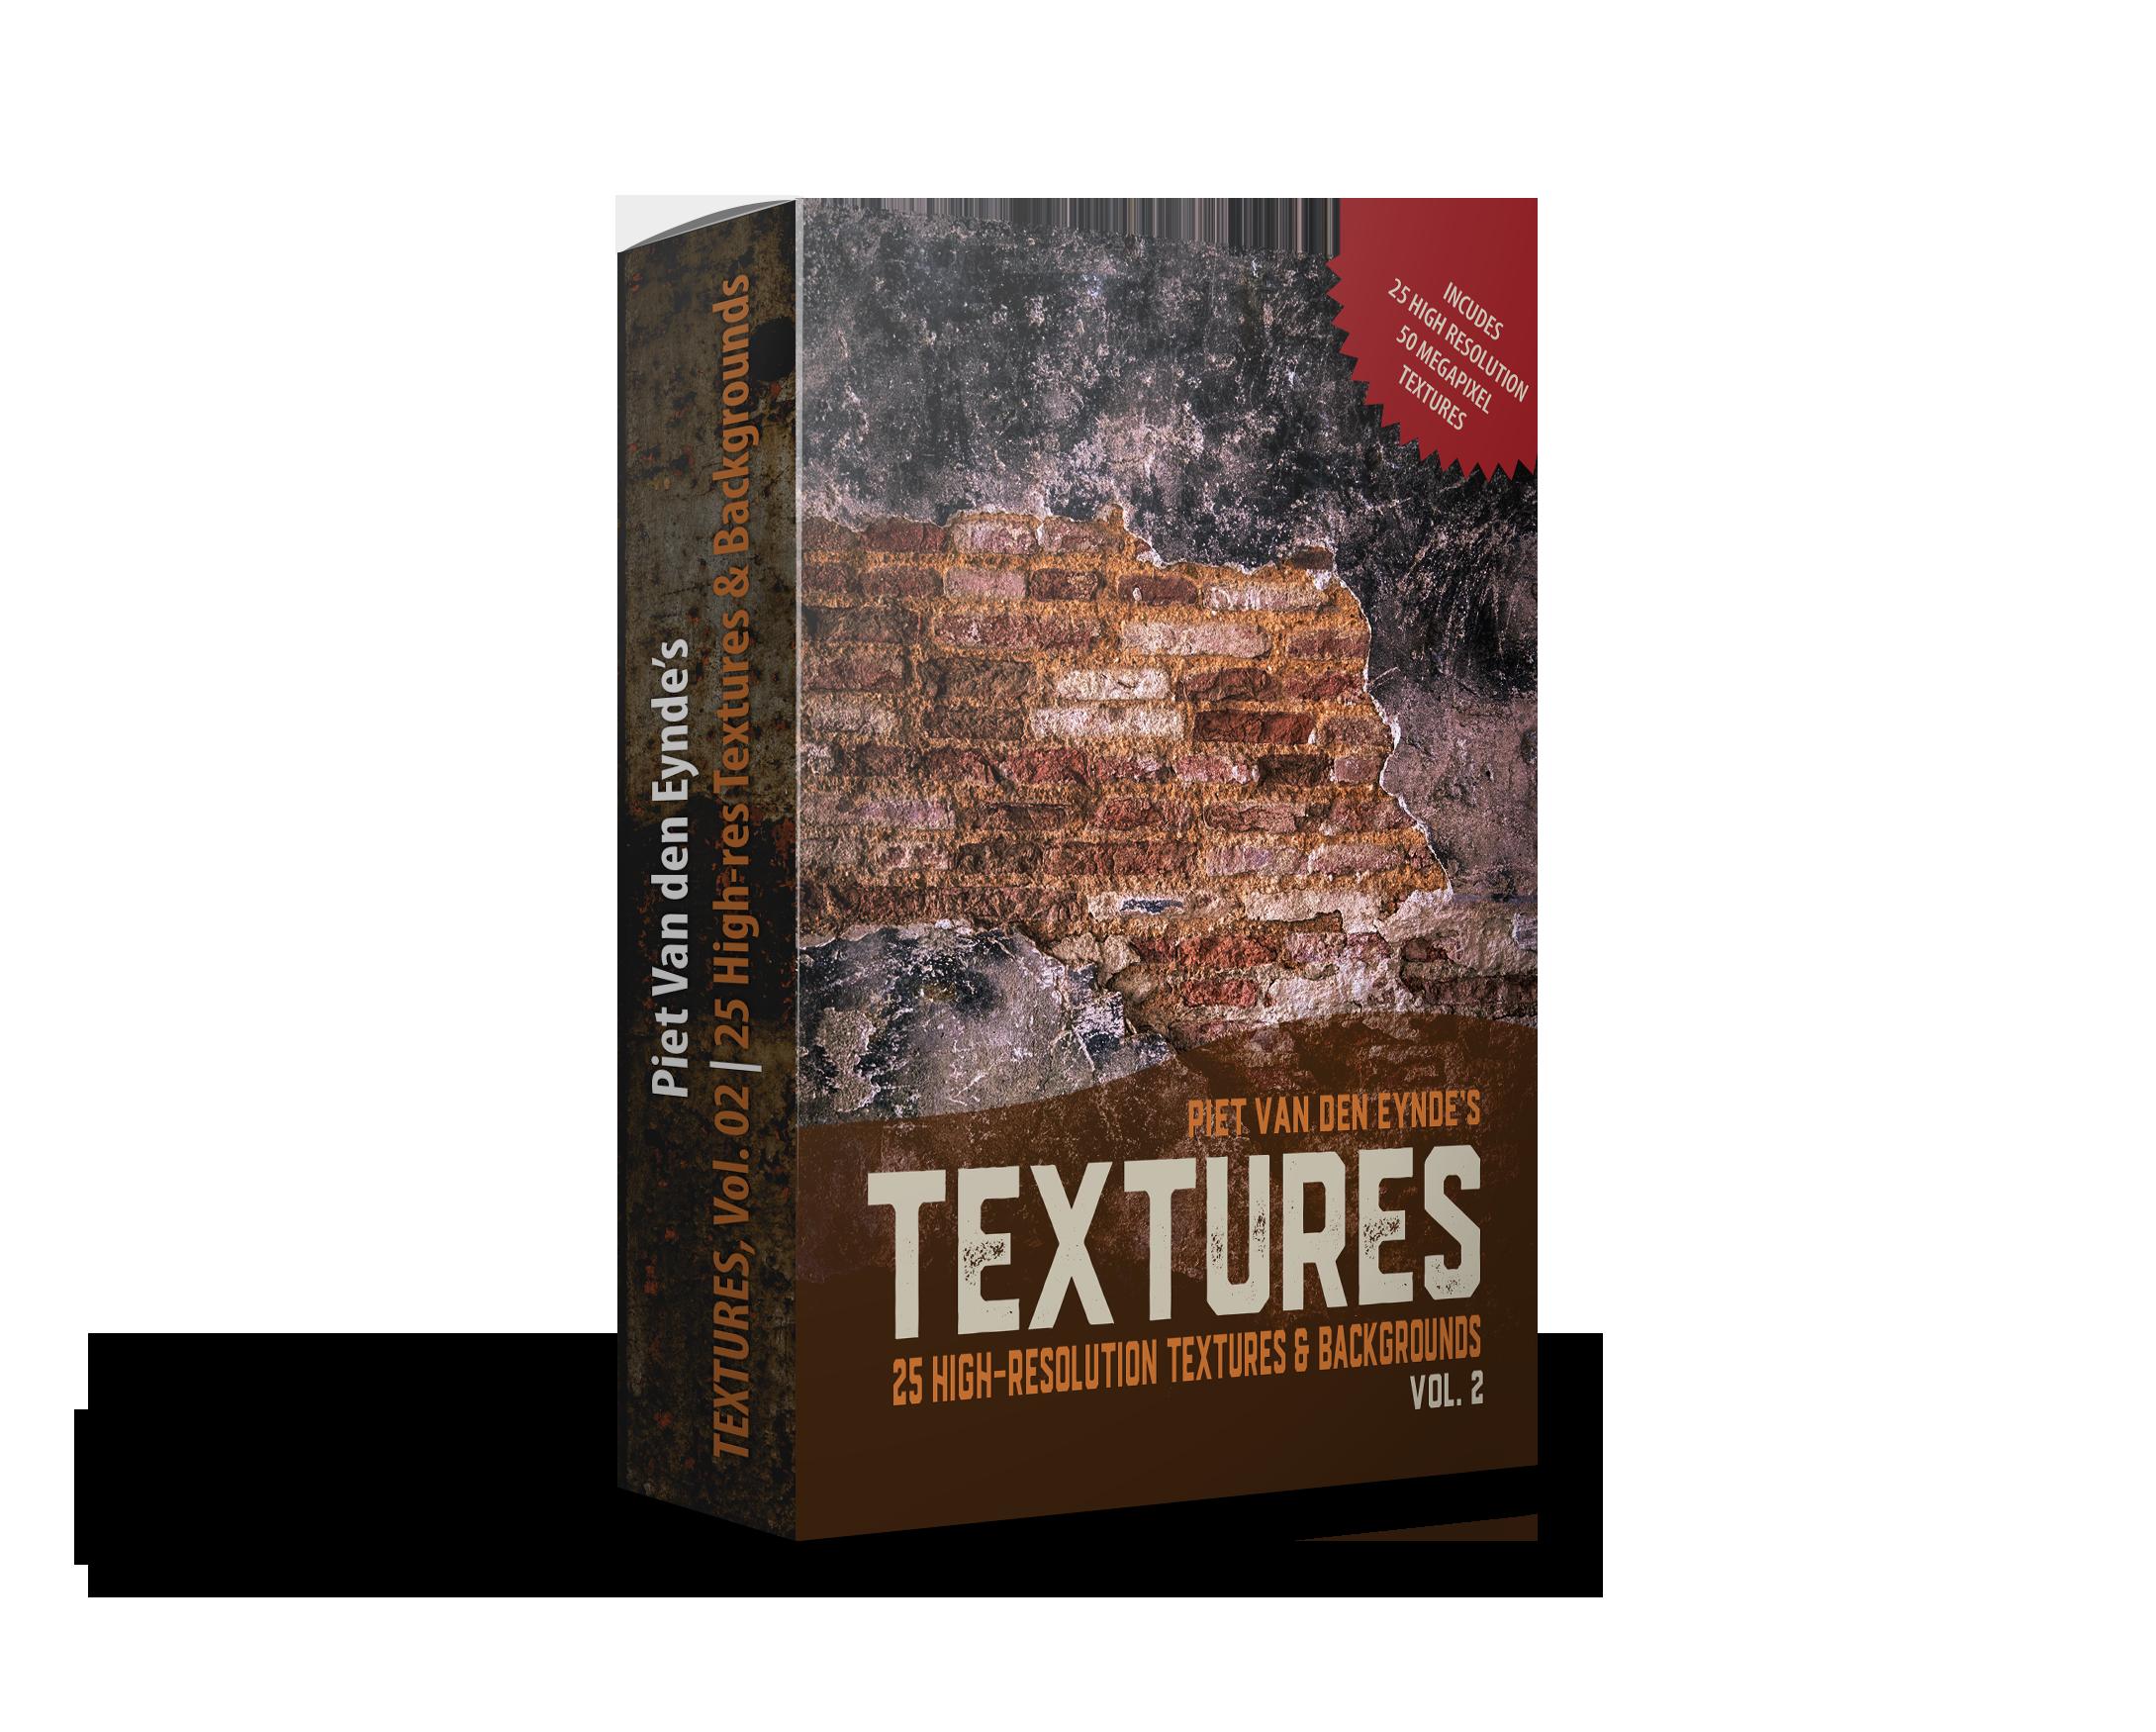 LightroomTextures-Vol2_box_mockup.png